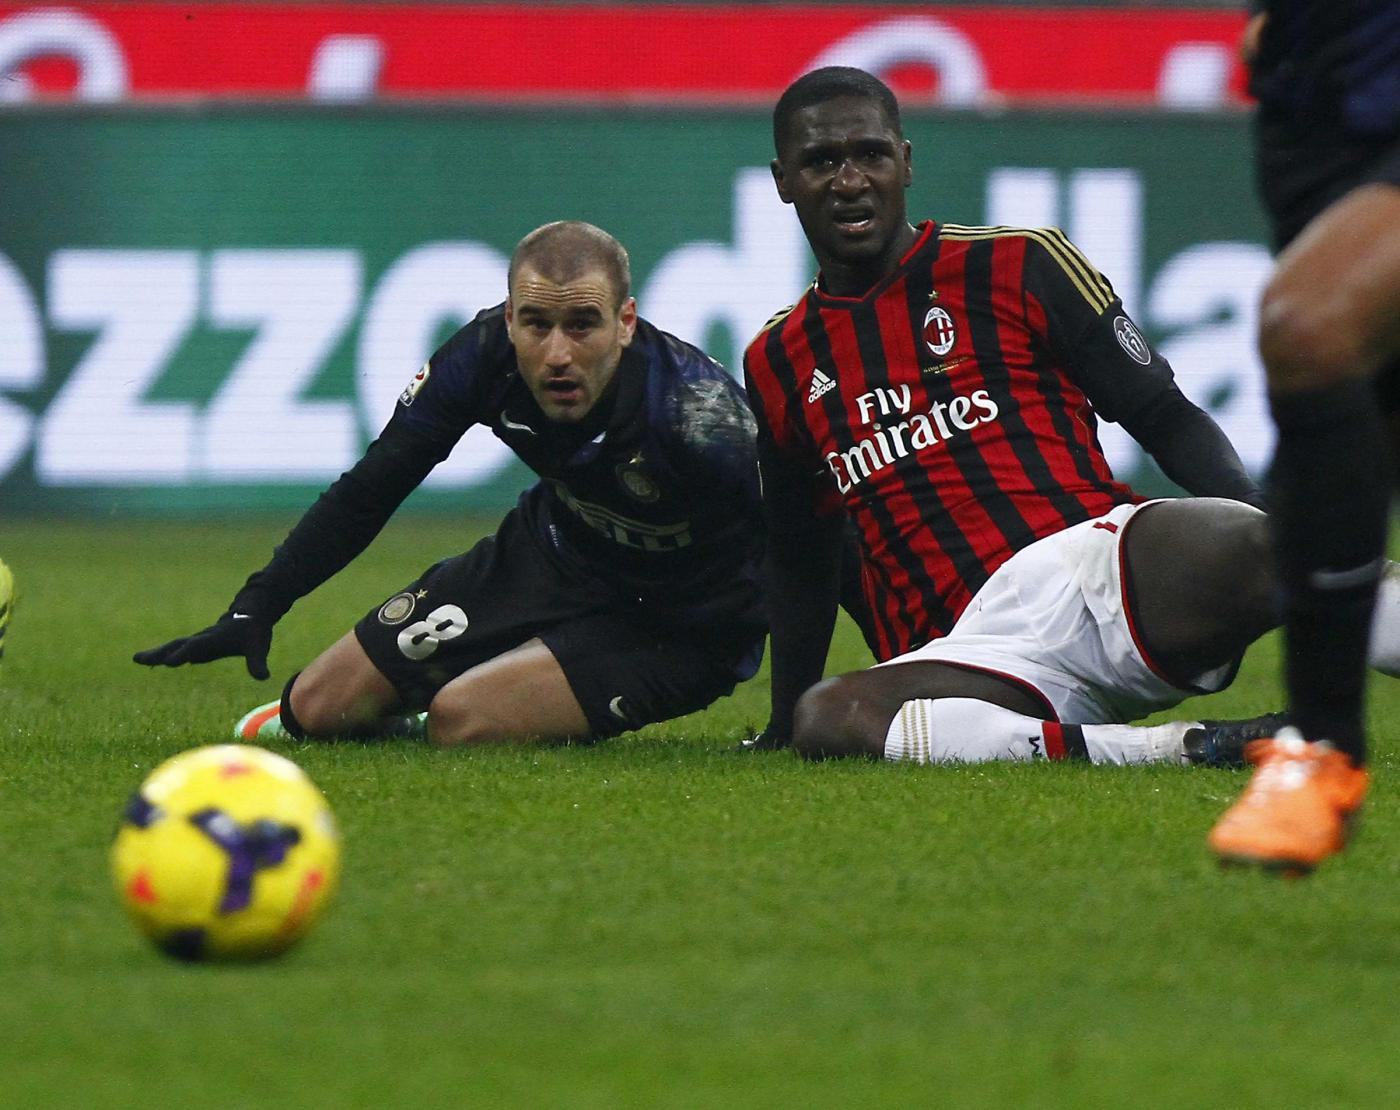 Derby Milan Inter 4 maggio 2014